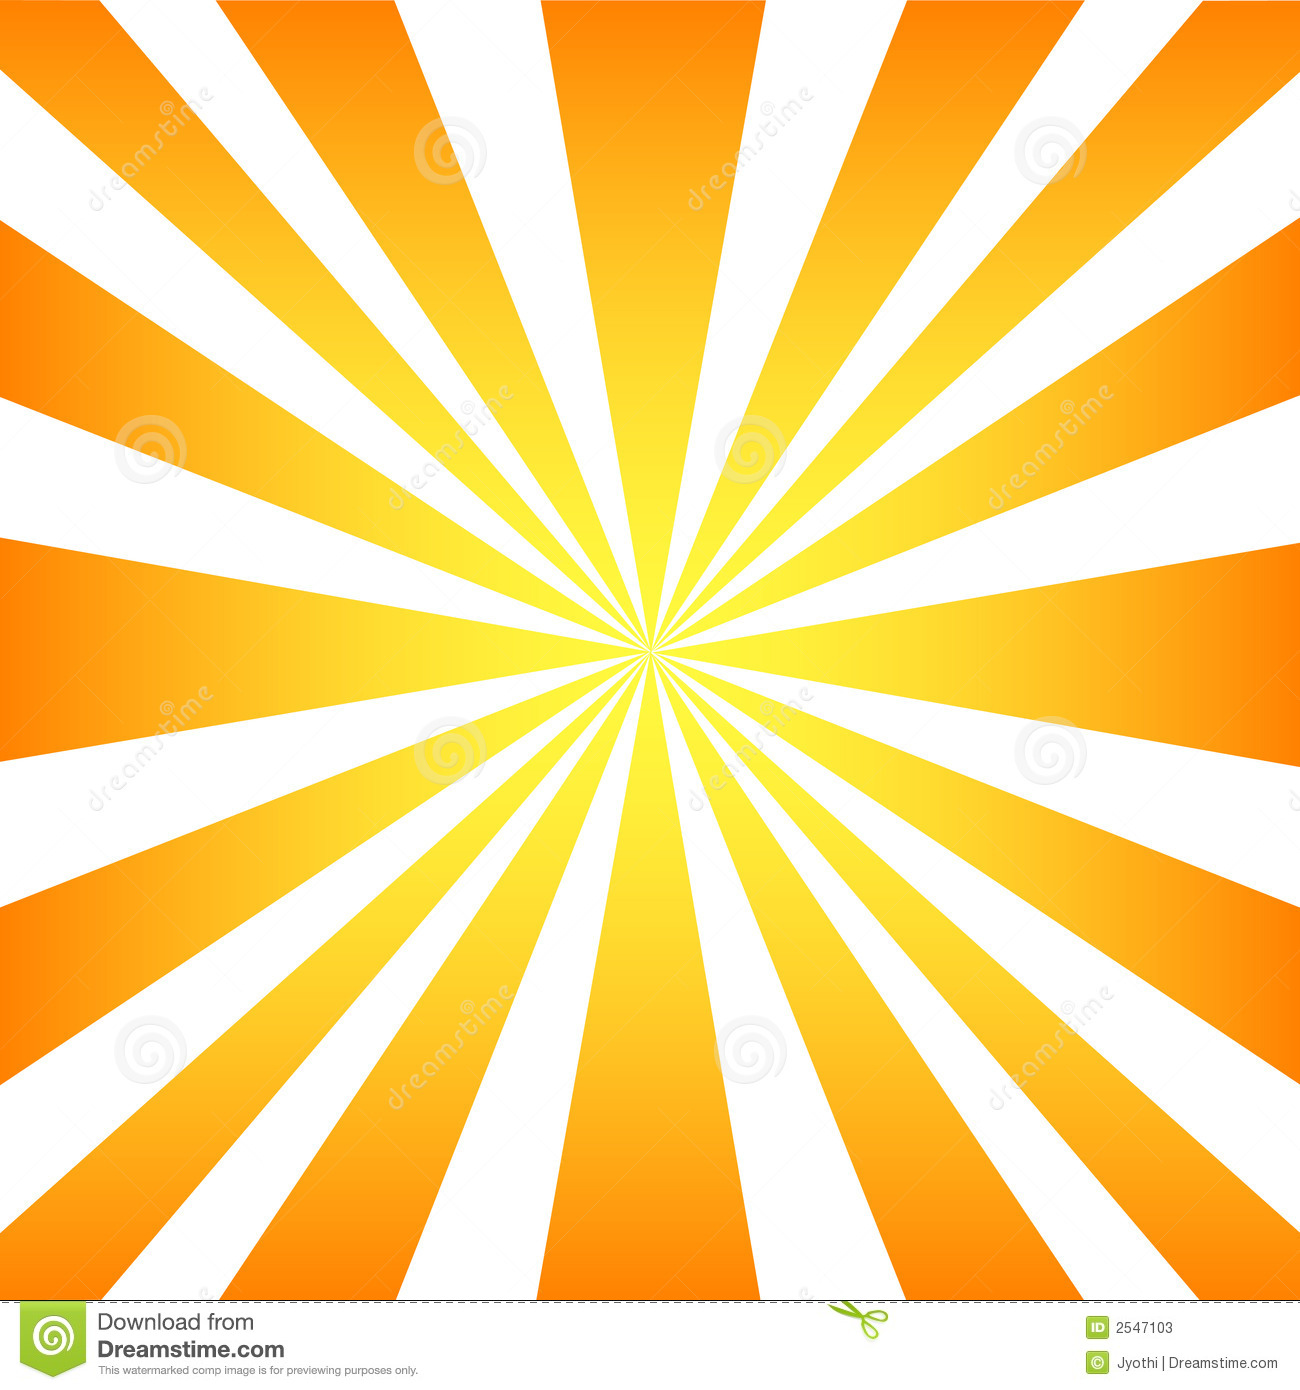 Sun Rays Stock Photos Image 2547103